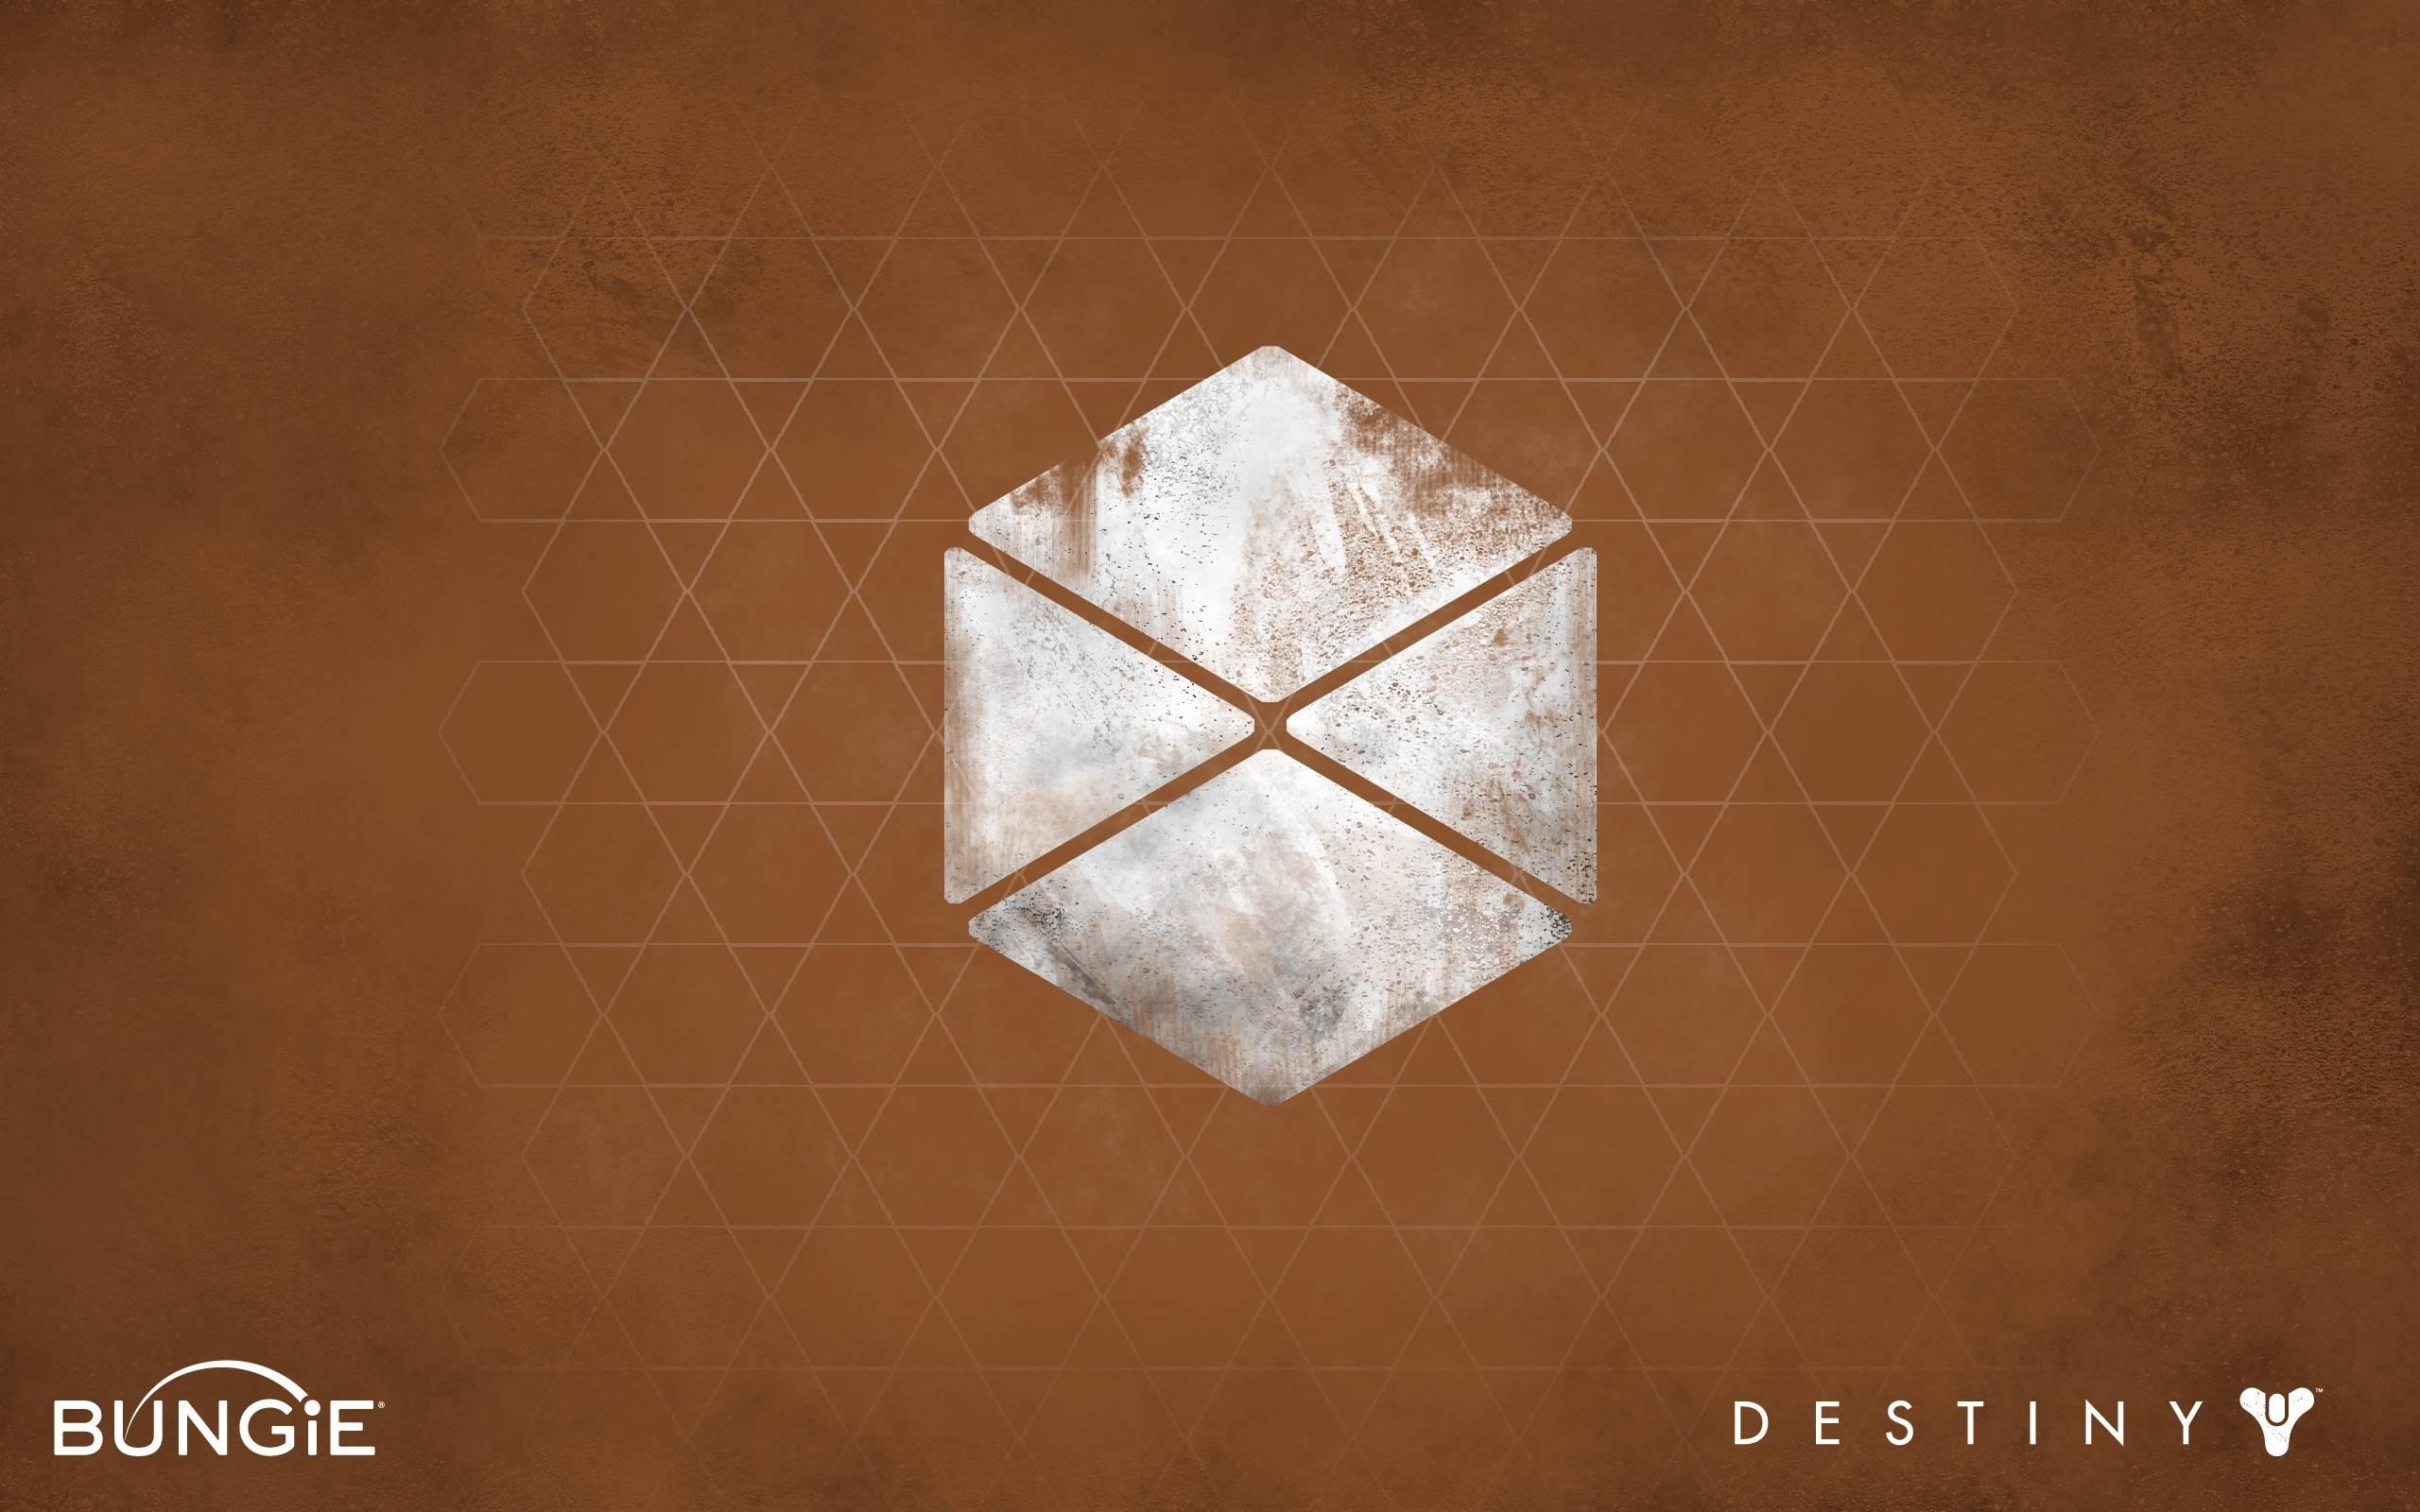 High Res Destiny's Wallpaper (2560×1600) > Destiny   Forums   Bungie.net